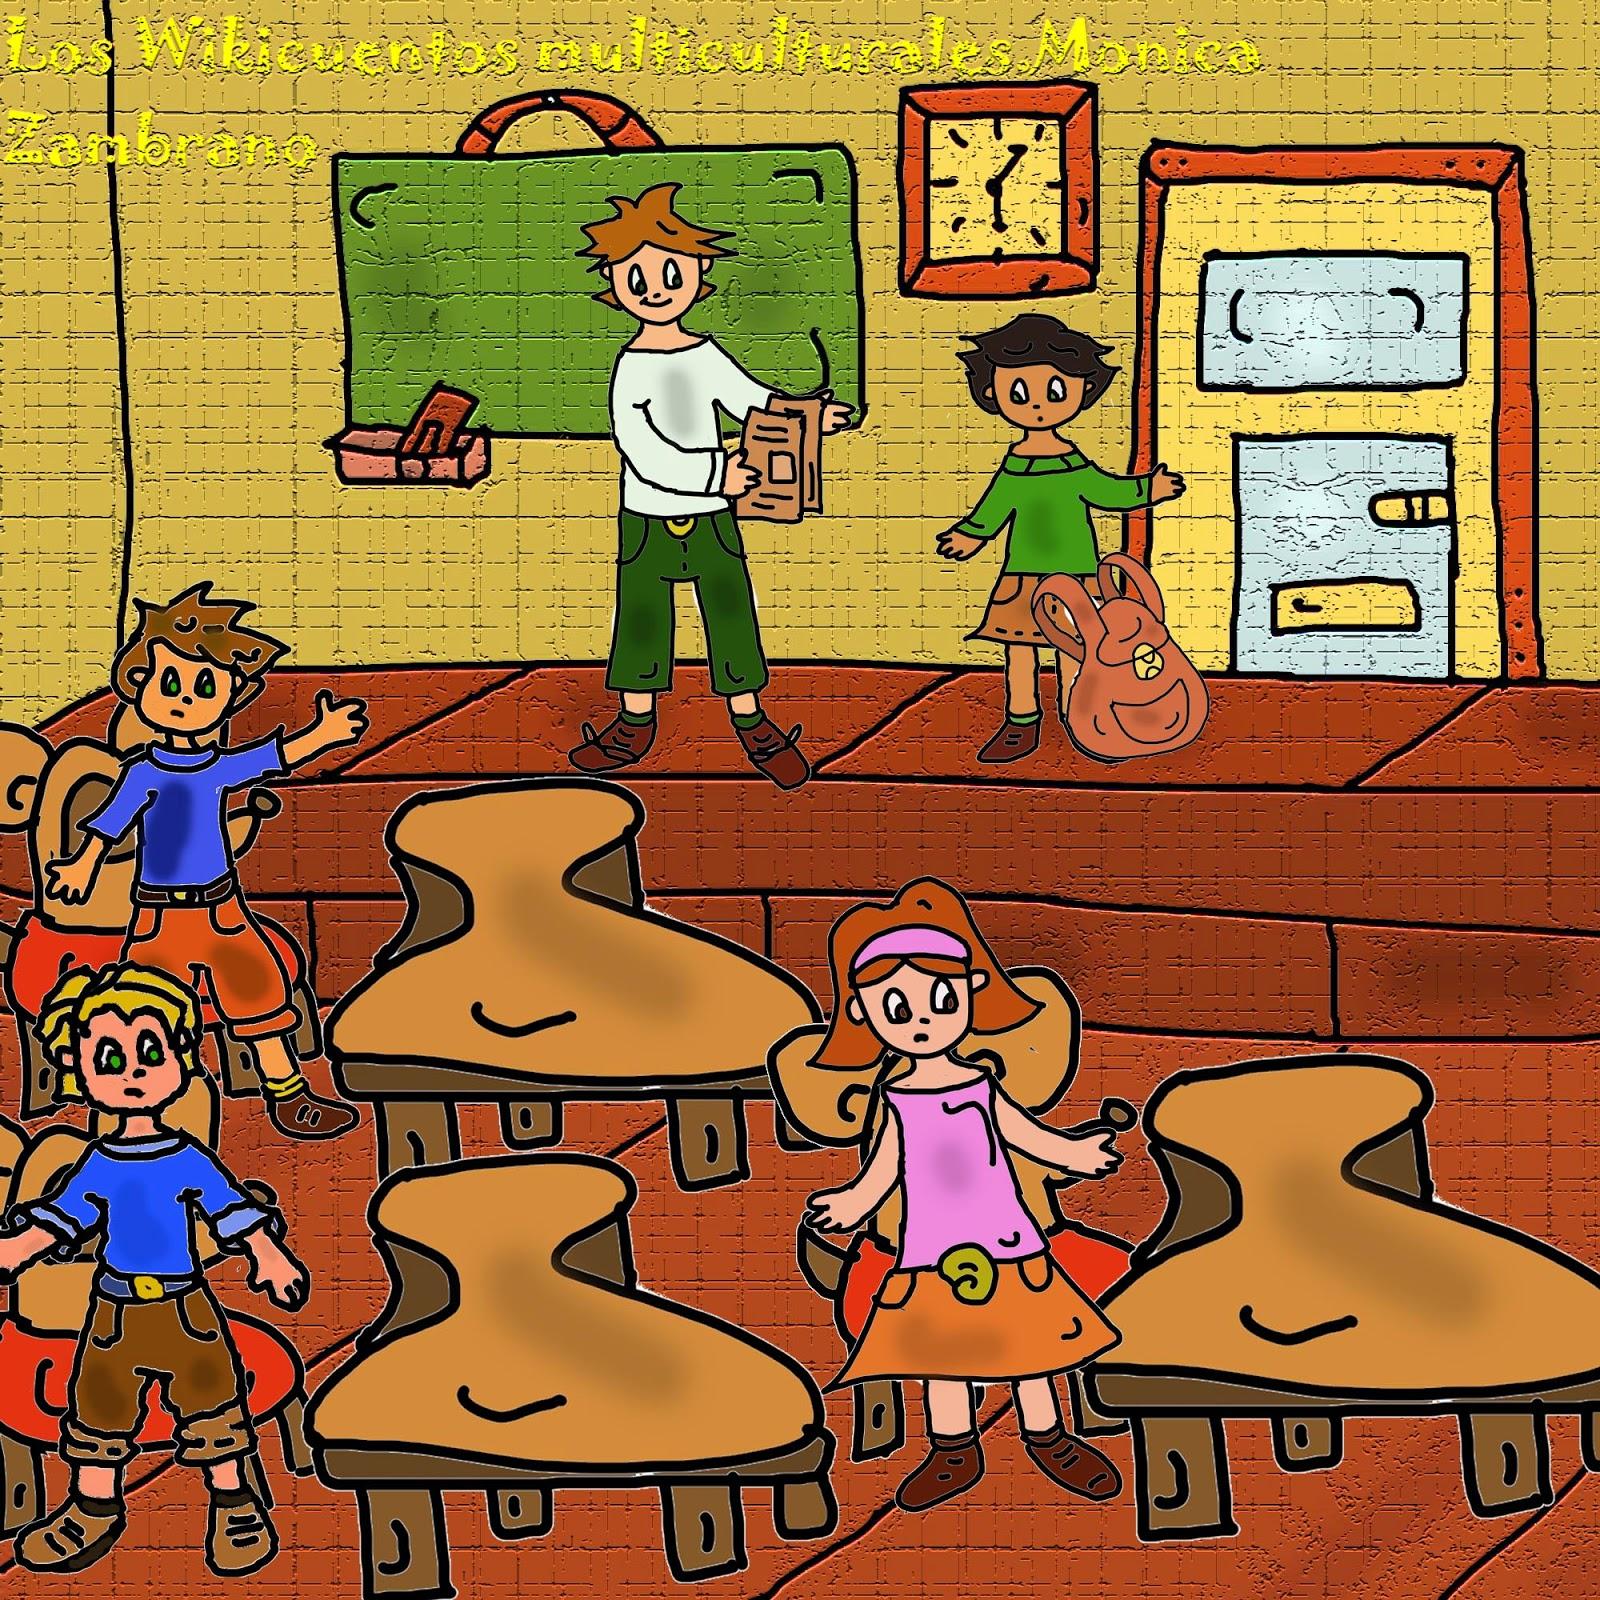 Cuentos infantiles de 3 a 5 a os marzo 2014 for Actividades en el salon de clases